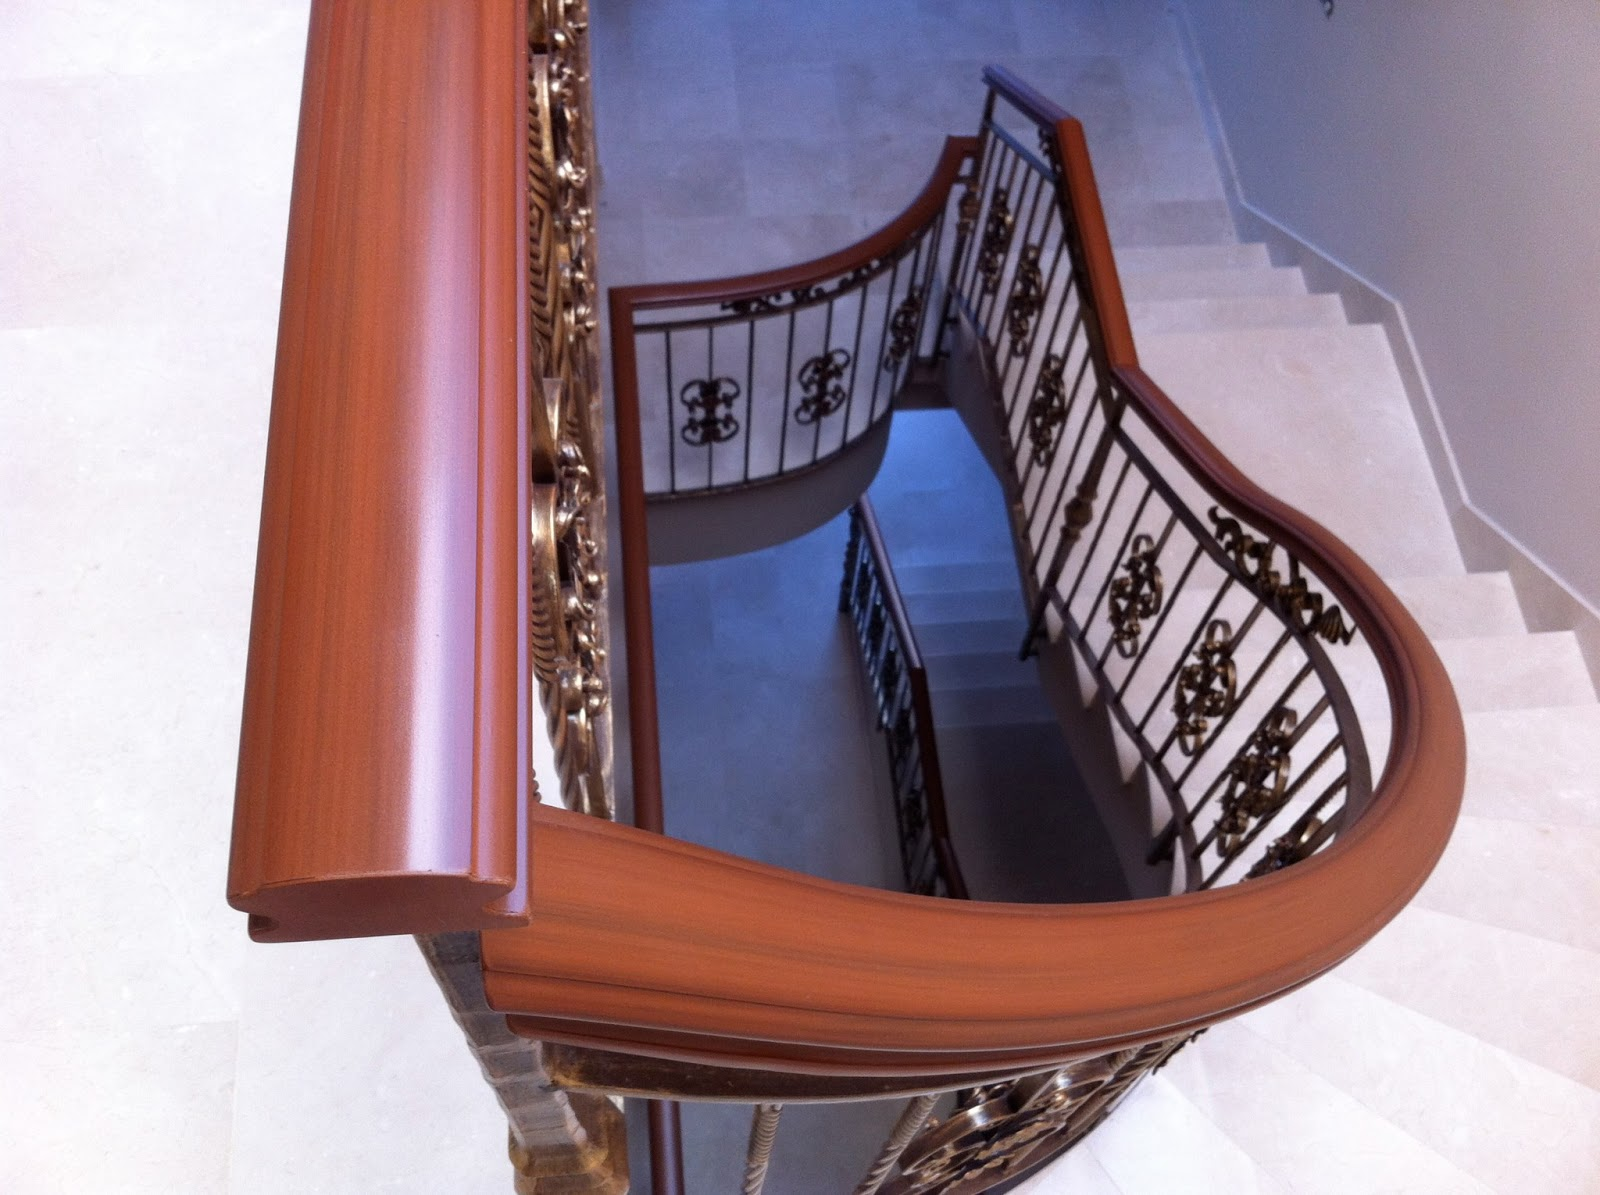 torneados munoz algerie rampes d escalier en fer forg avec main courante en pvc oran. Black Bedroom Furniture Sets. Home Design Ideas